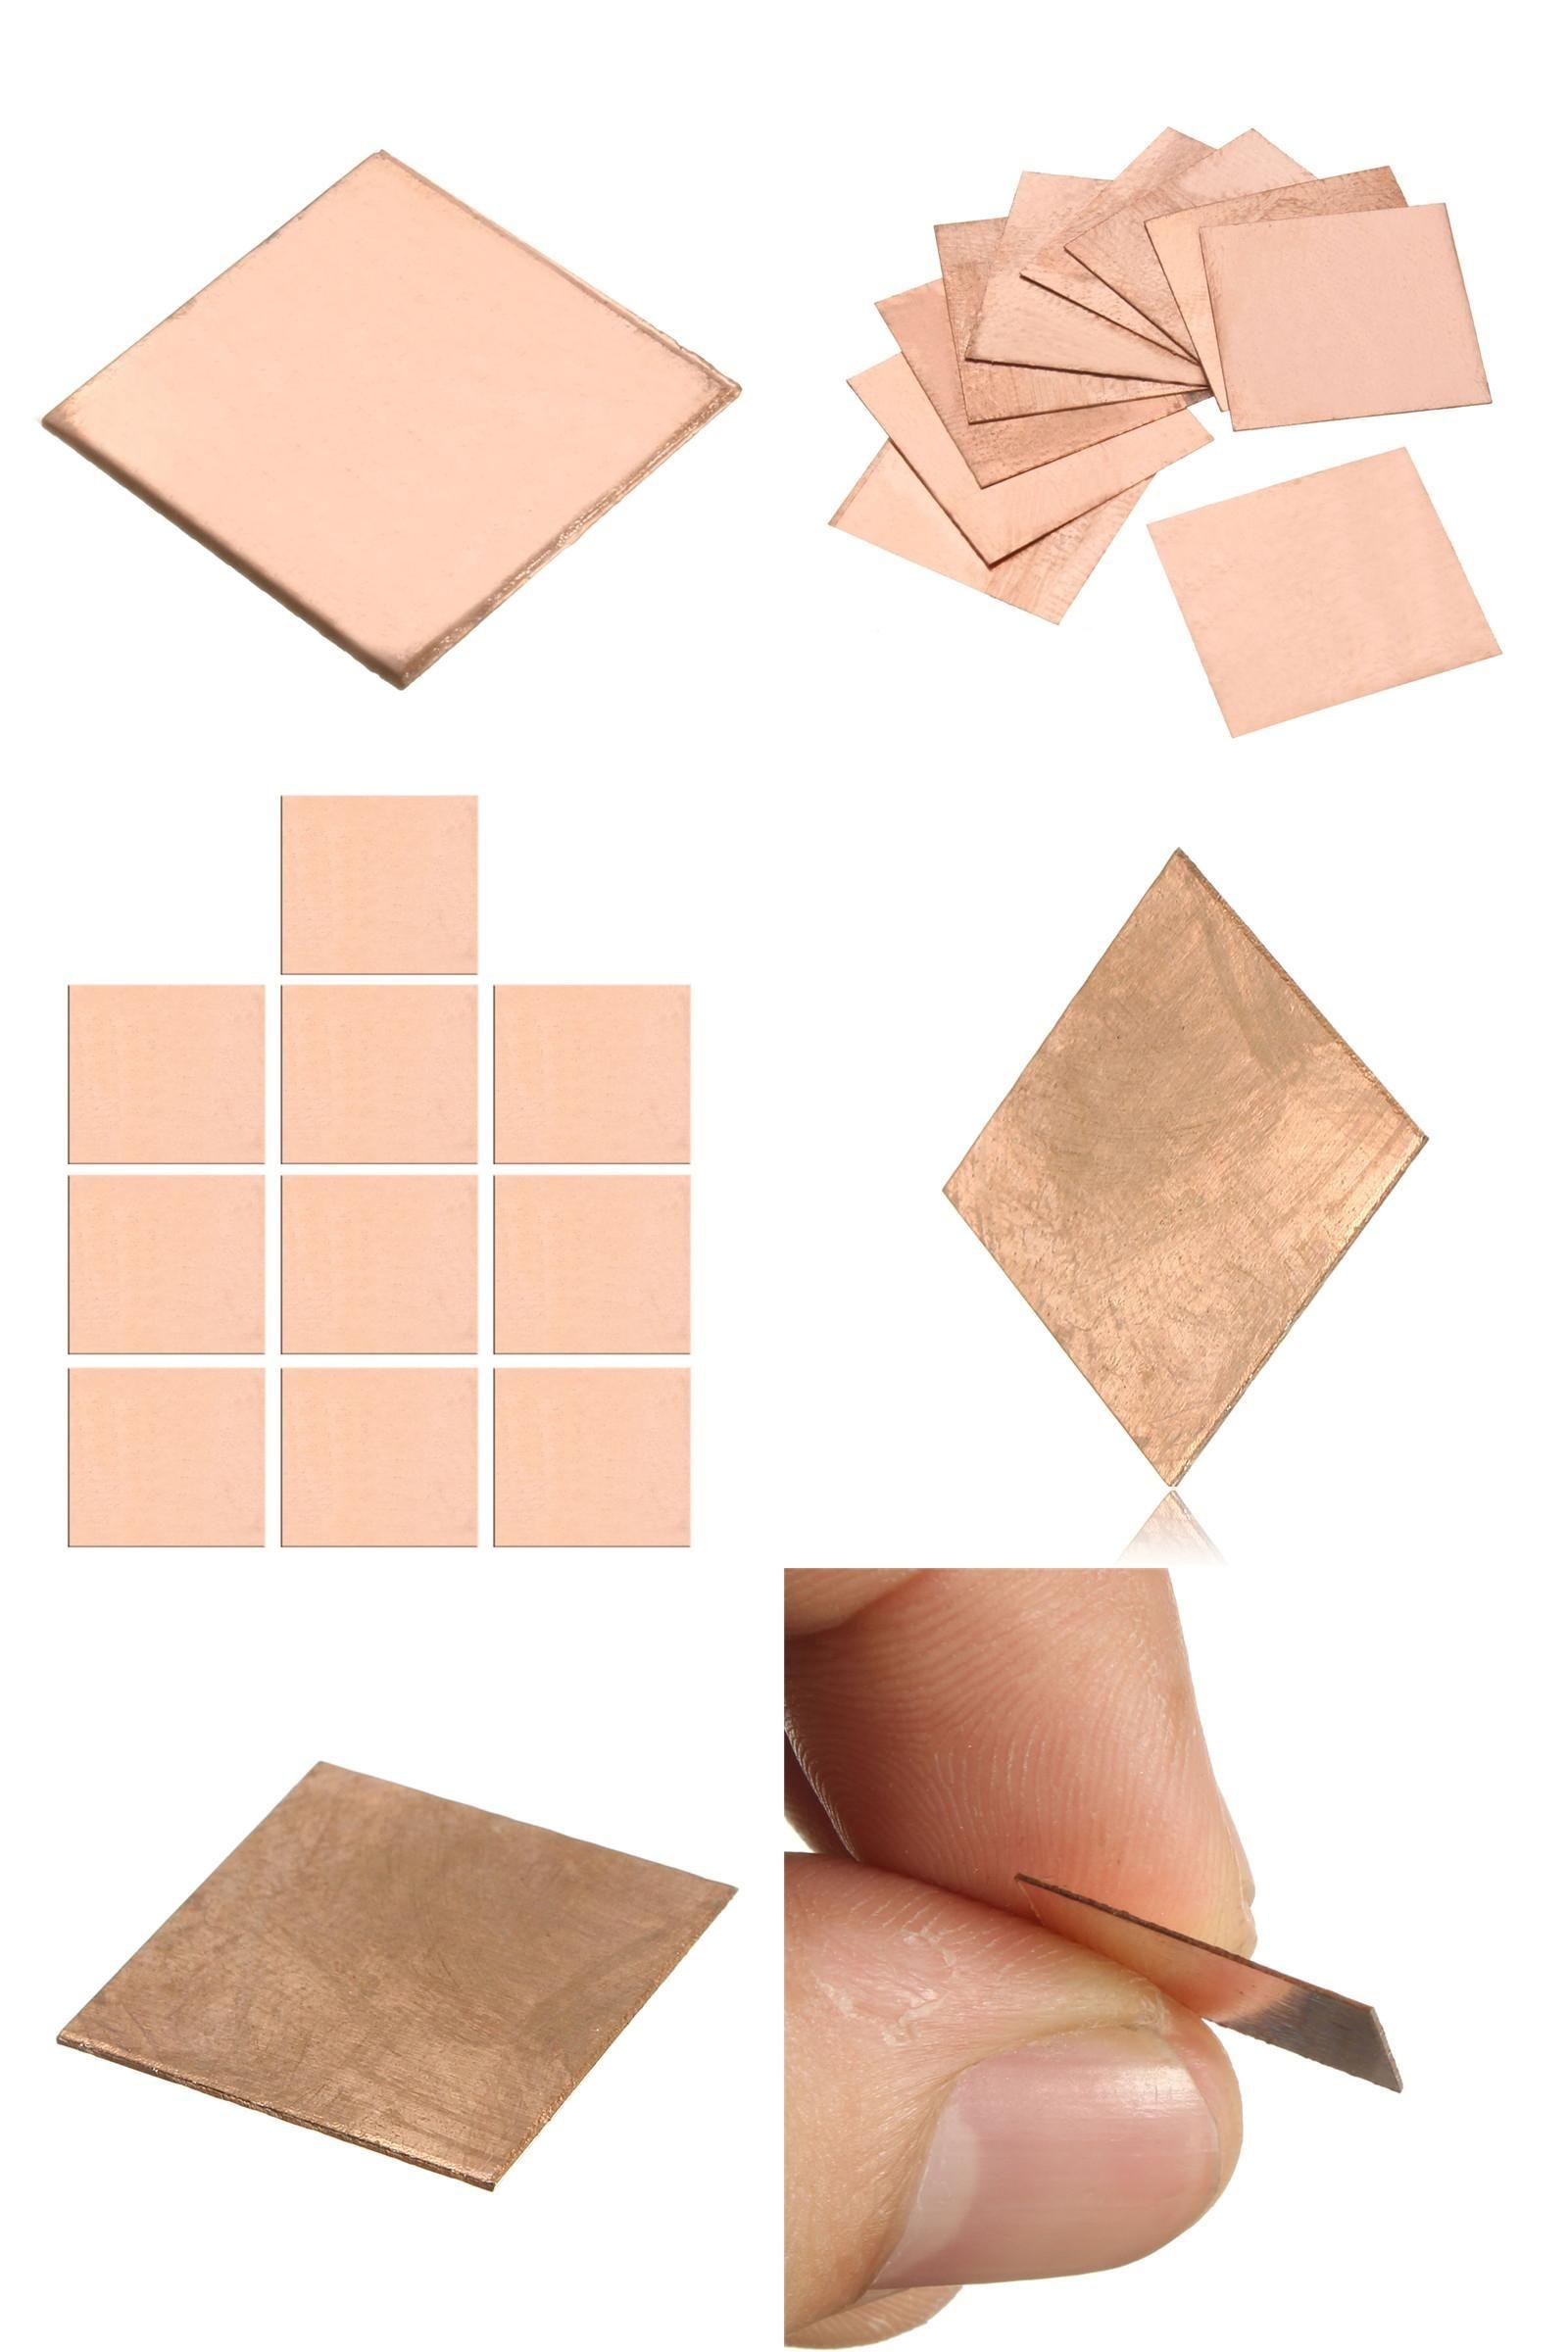 Visit To Buy 10pcs Laptop Copper Sheet Plate Strip Shim 0 1mm 0 3mm 0 5mm 0 8mm Thermal Pad Heatsink Sheet For Gpu Cpu Vga Chip R Copper Sheets Heatsink Vga